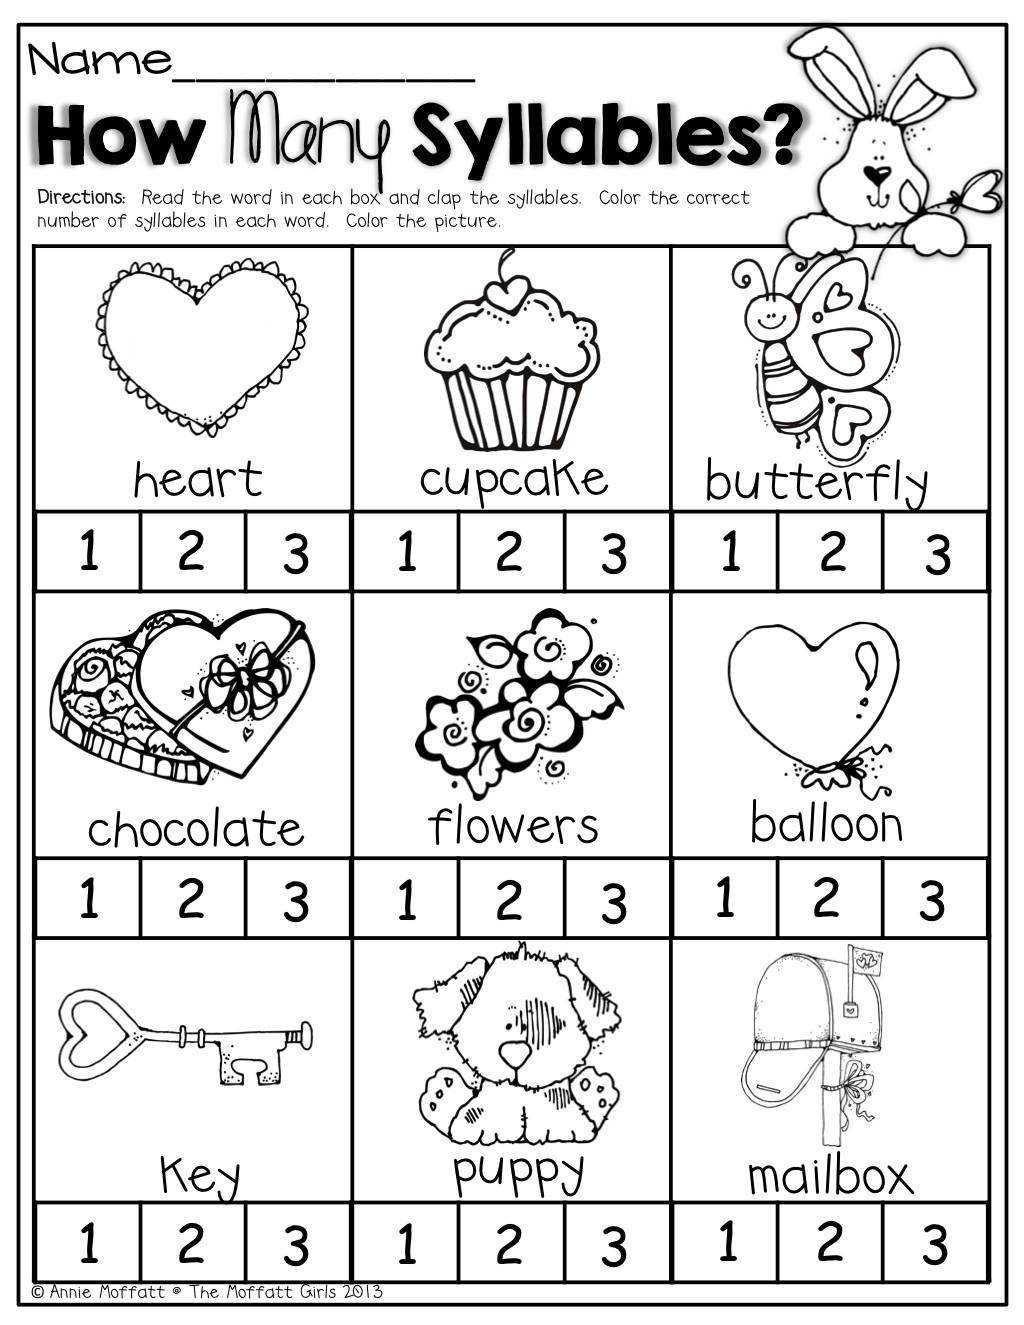 Syllables Worksheet for Kindergarten 20 Syllable Worksheets for Kindergarten